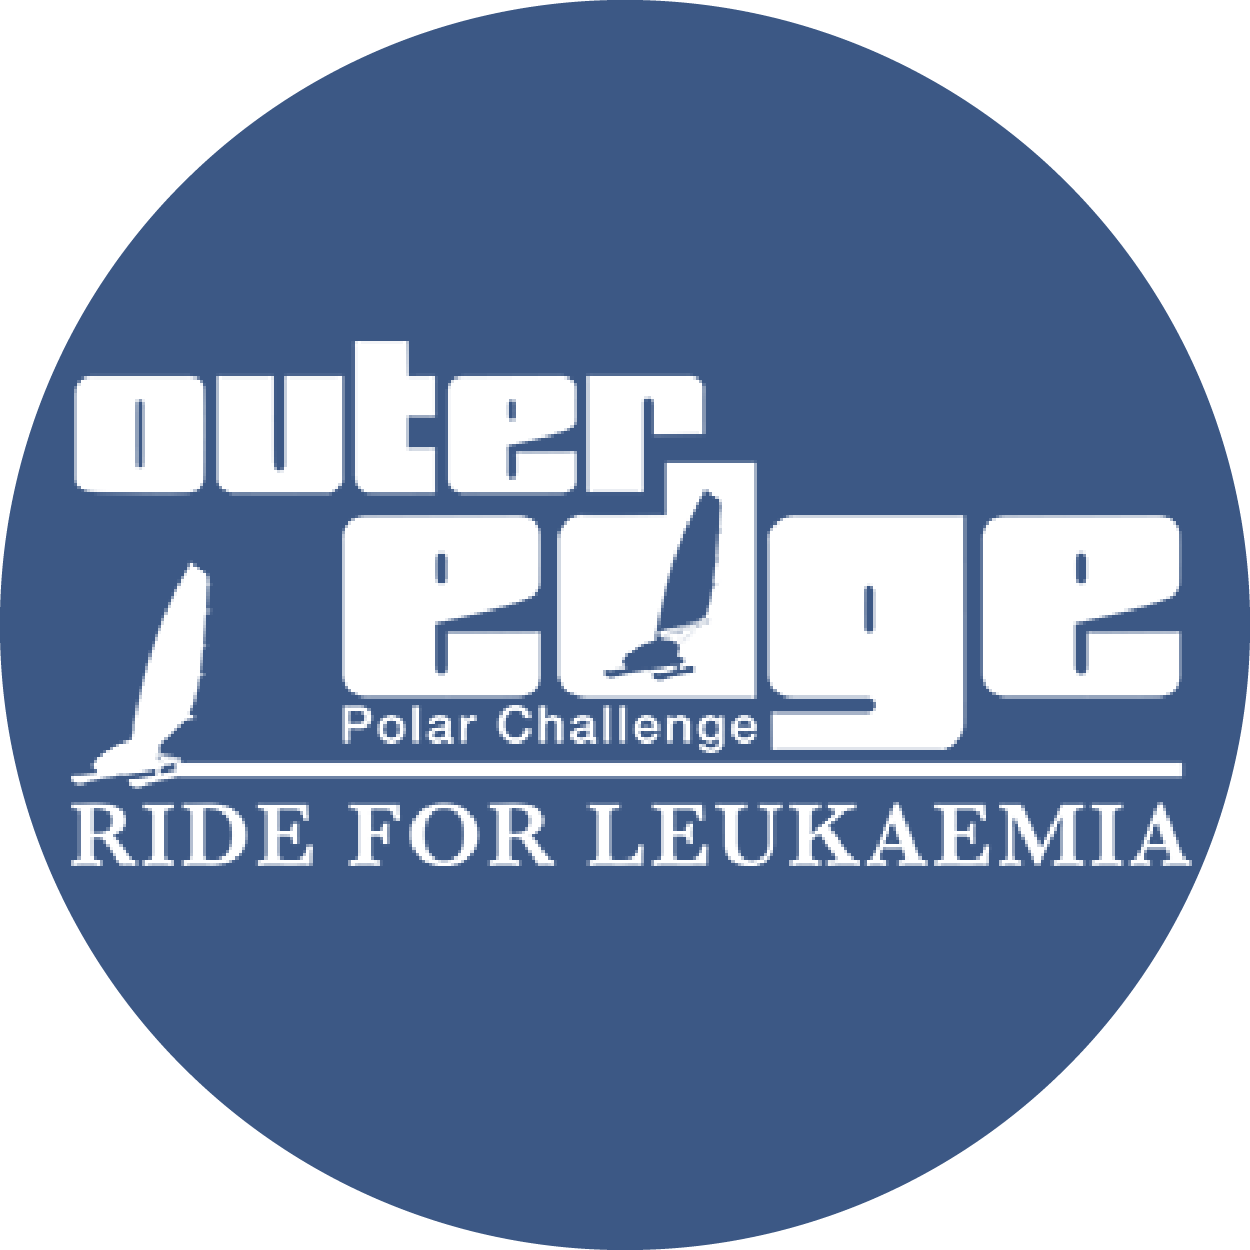 outer edge solar challenge logo australian solar quotes sponsored